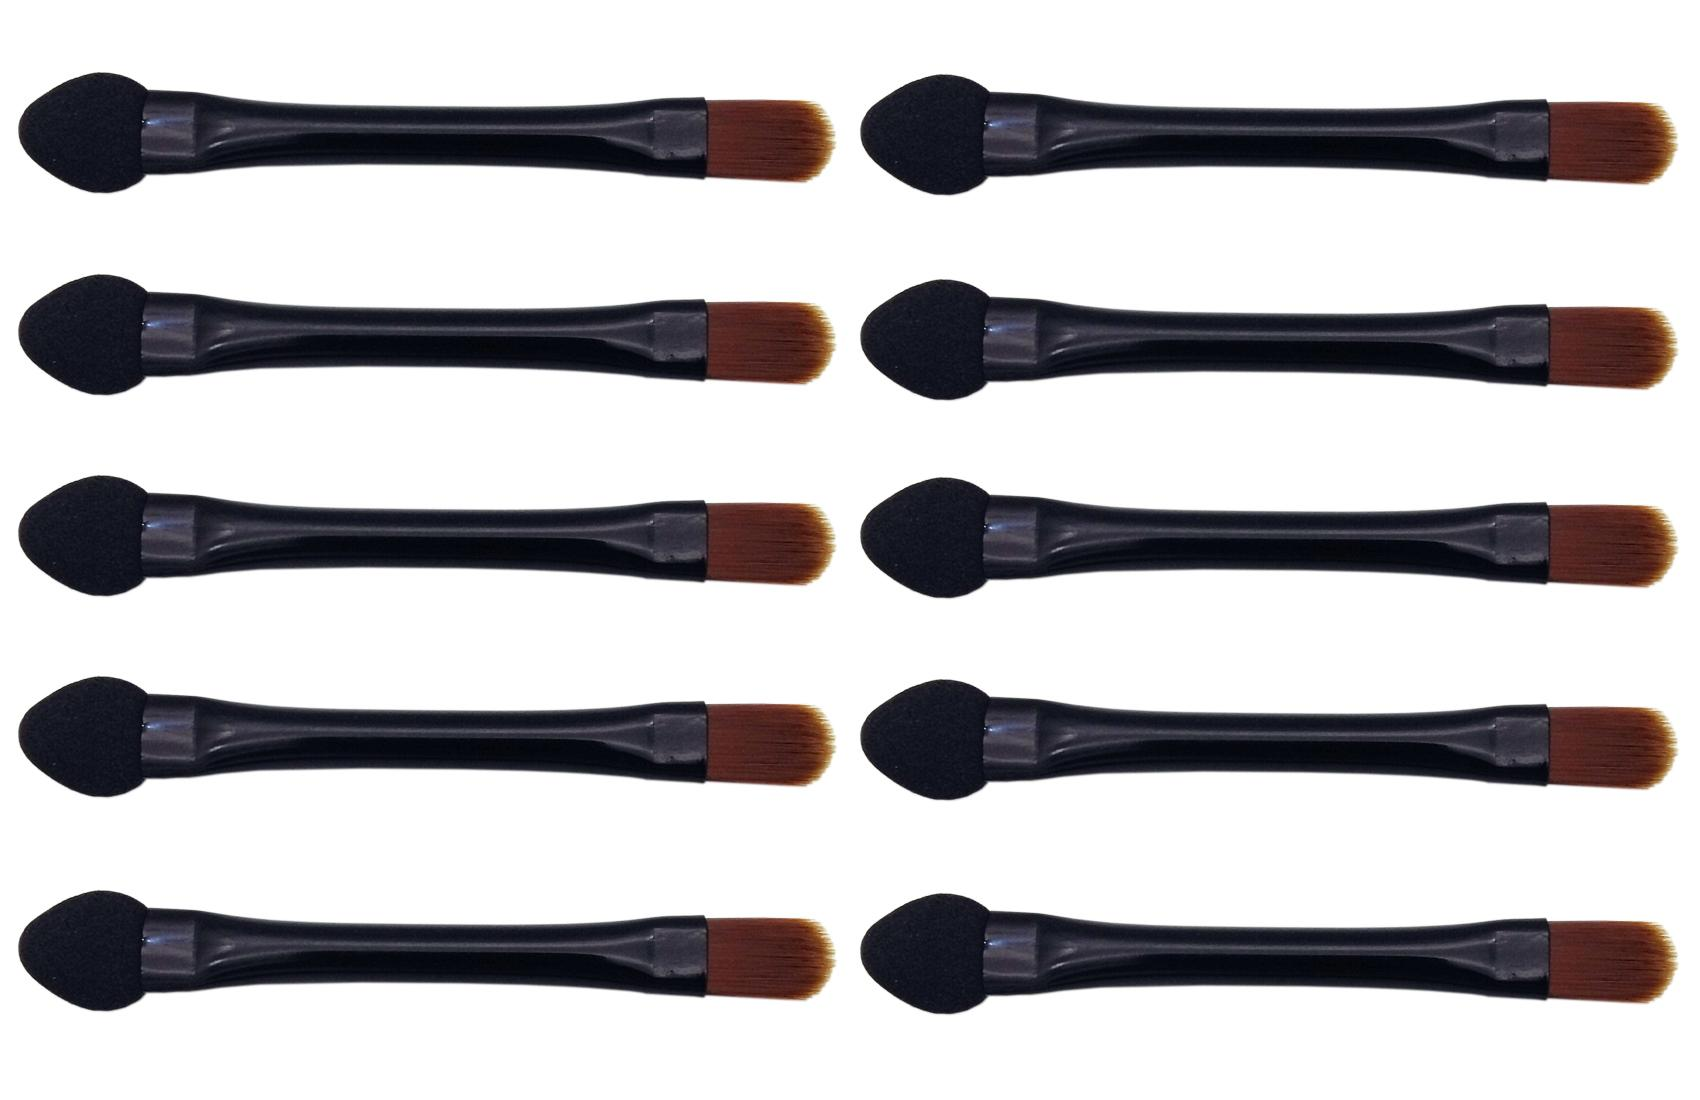 Vôsaidi Eyeshadow Brushes Makeup Brush 10pcs Eye shadow Sponge Dual Sides Eyeshadow Applicator Travel Eyeshadow Brush Concealer Brush